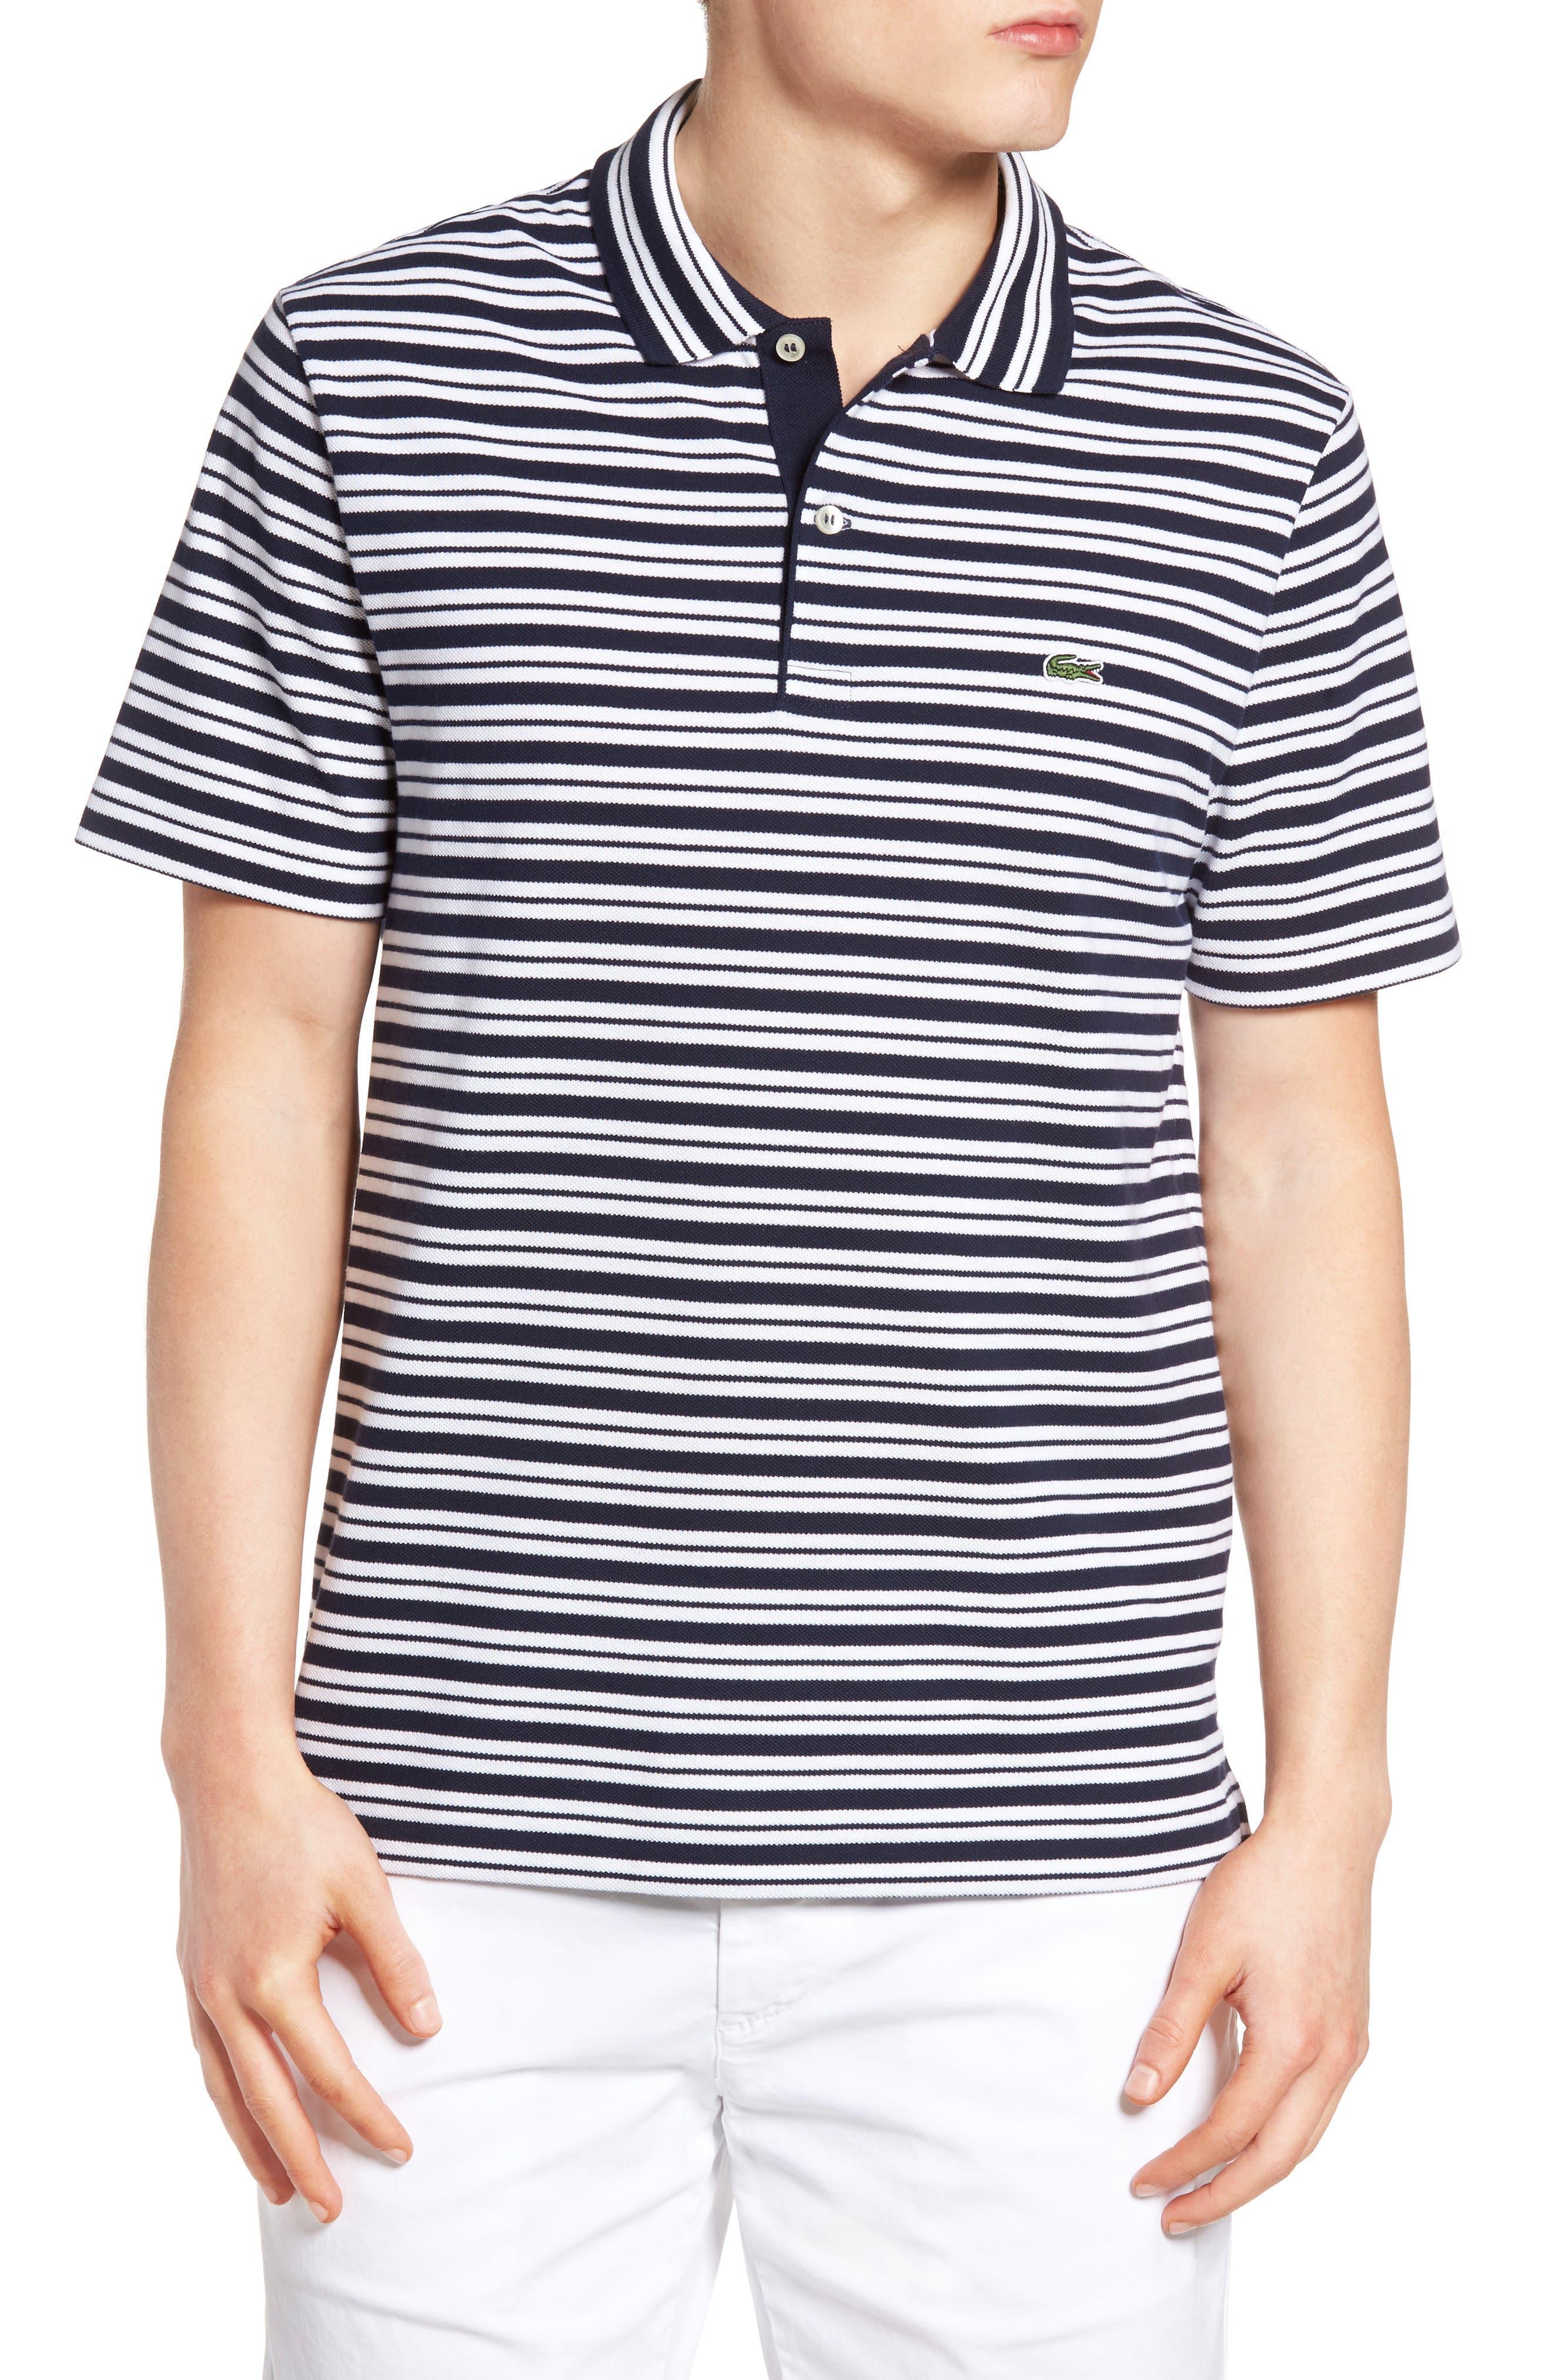 Main Image - Lacoste Striped Polo